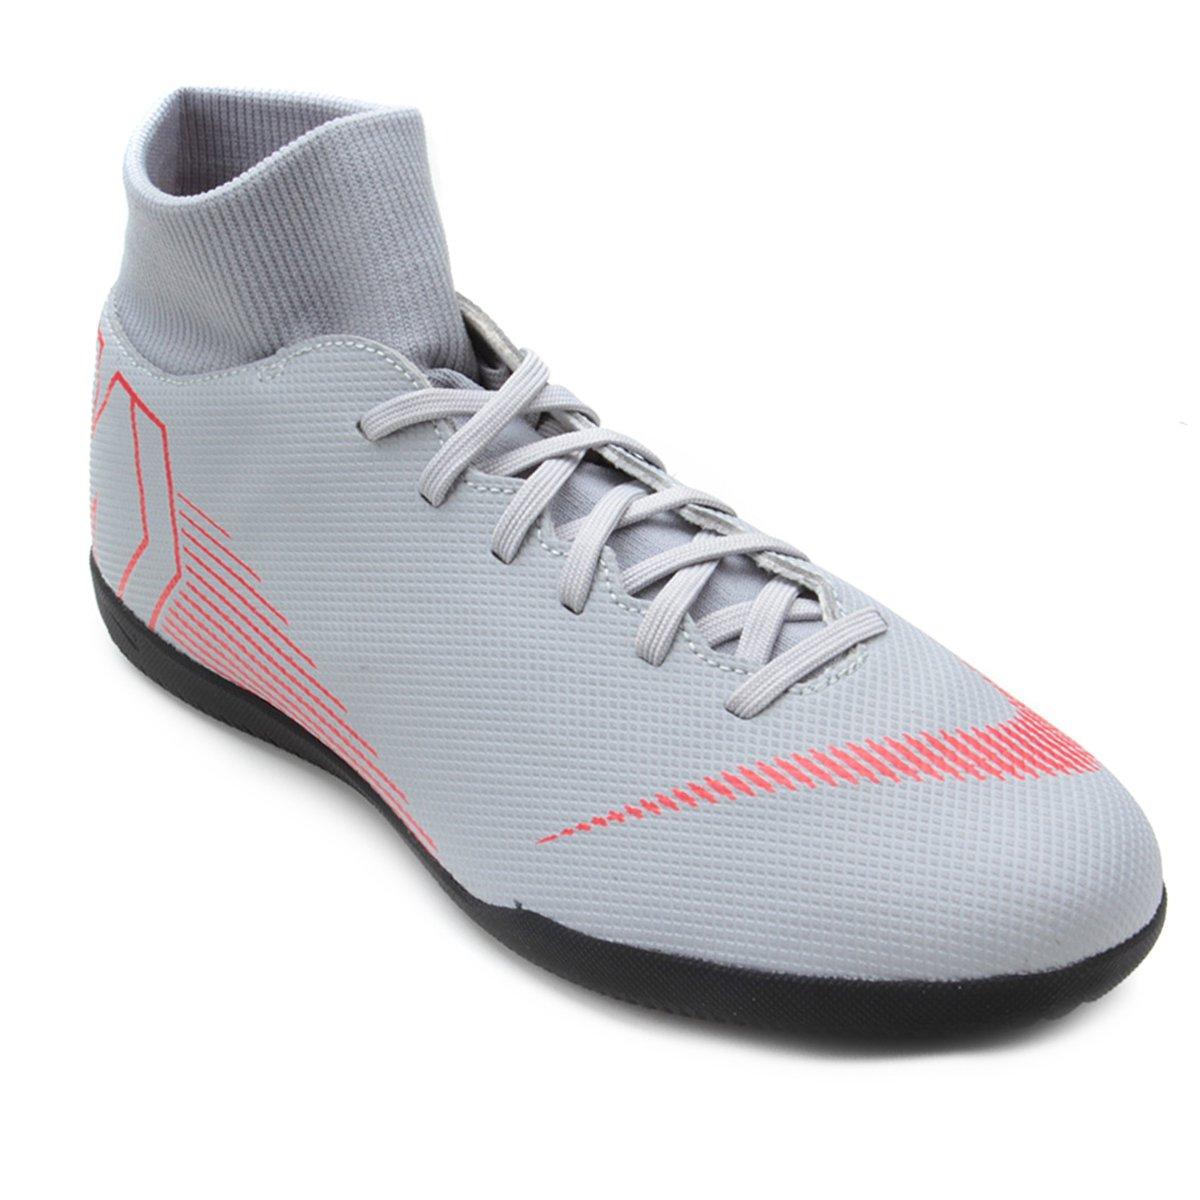 62a088a58f Chuteira Futsal Nike Mercurial Superfly 6 Club